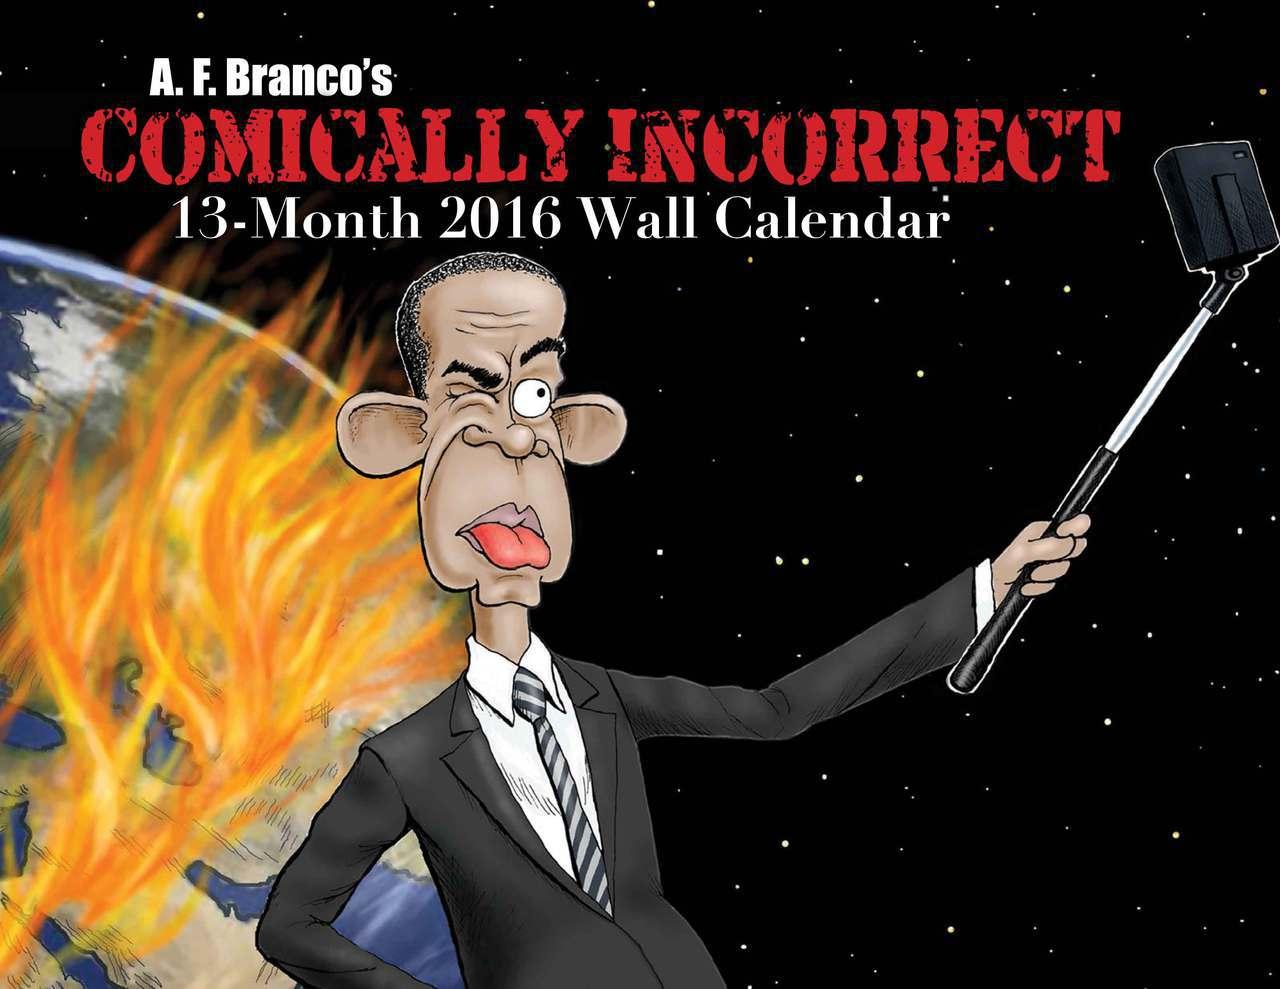 2016-calendar-proof-cover__63191.1442602902.1280.1280